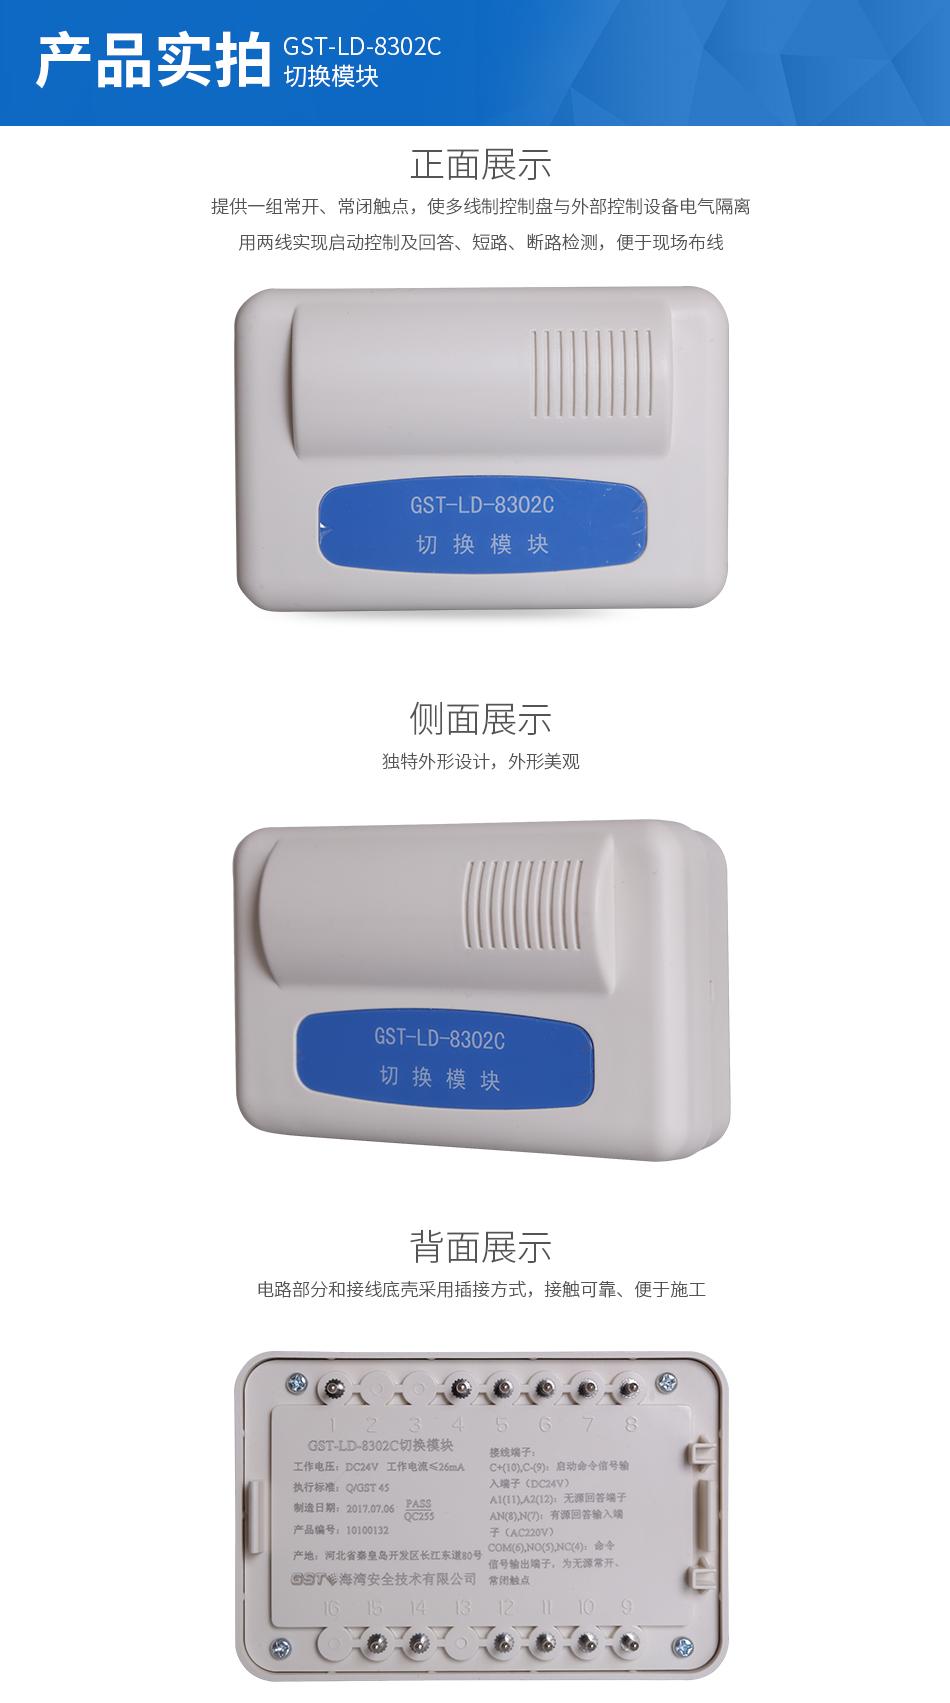 GST-LD-8302C切换模块产品实拍